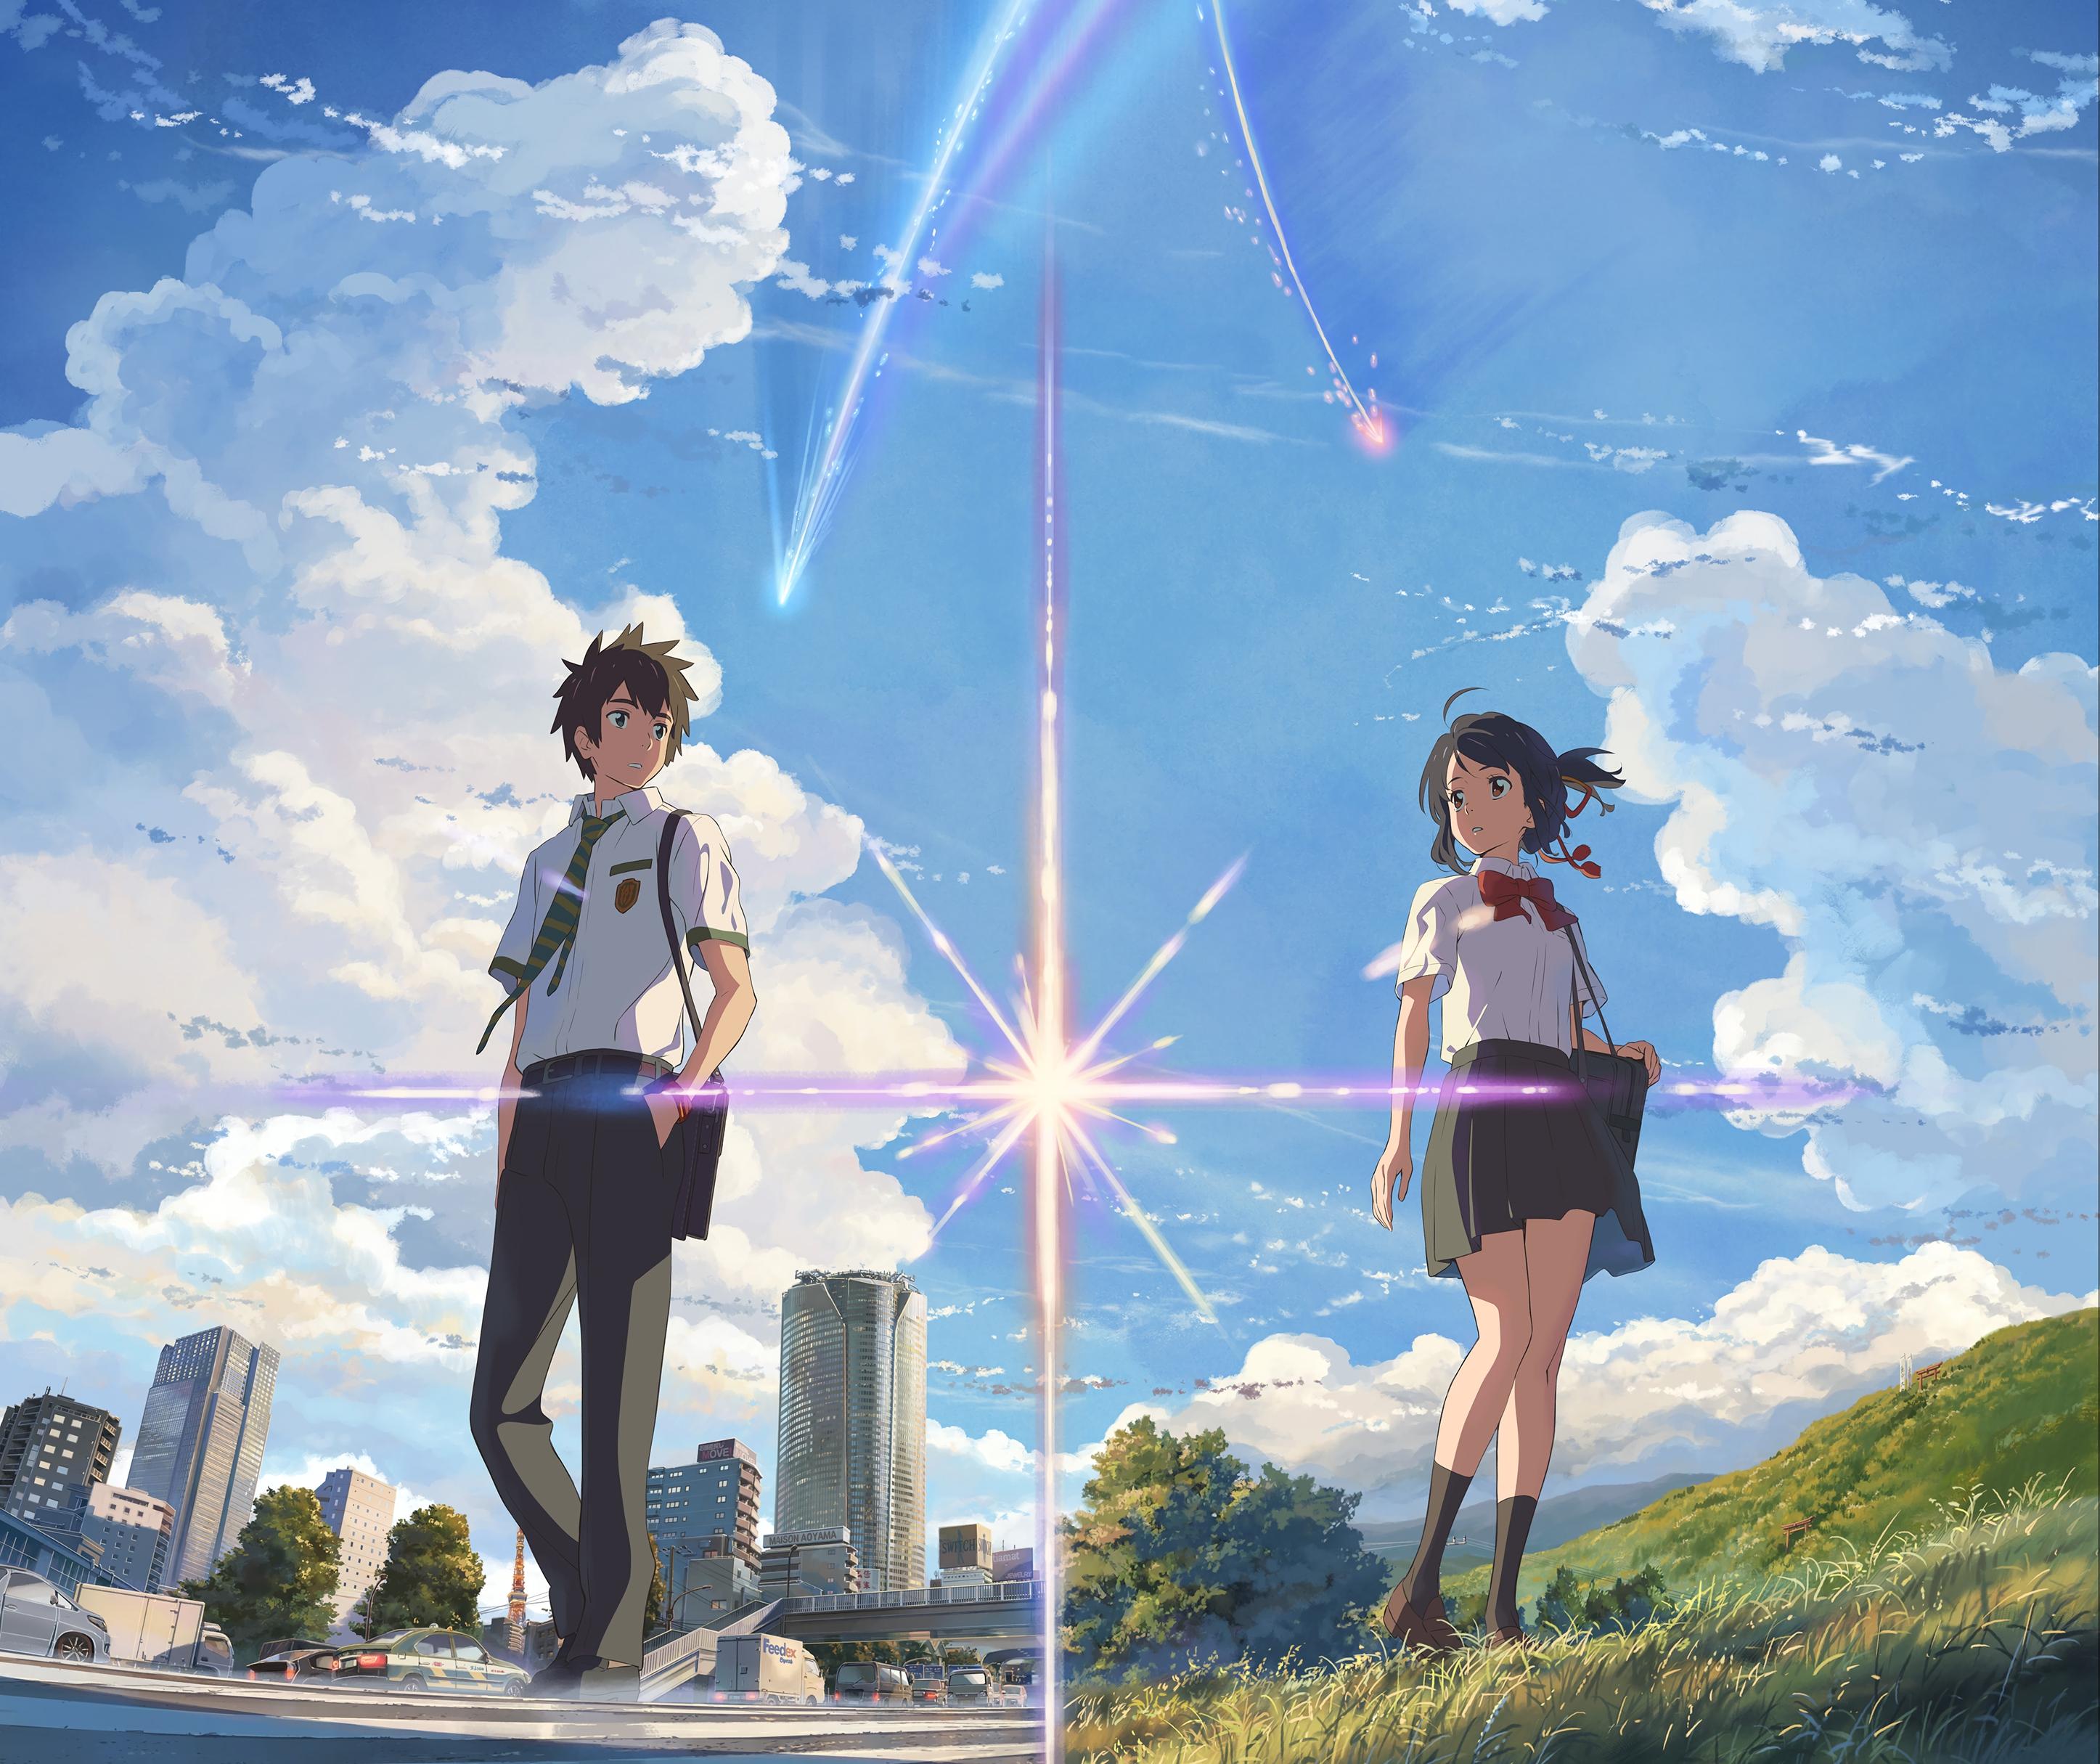 800+ Wallpaper Anime Couple Untuk 2 Hp HD Paling Baru